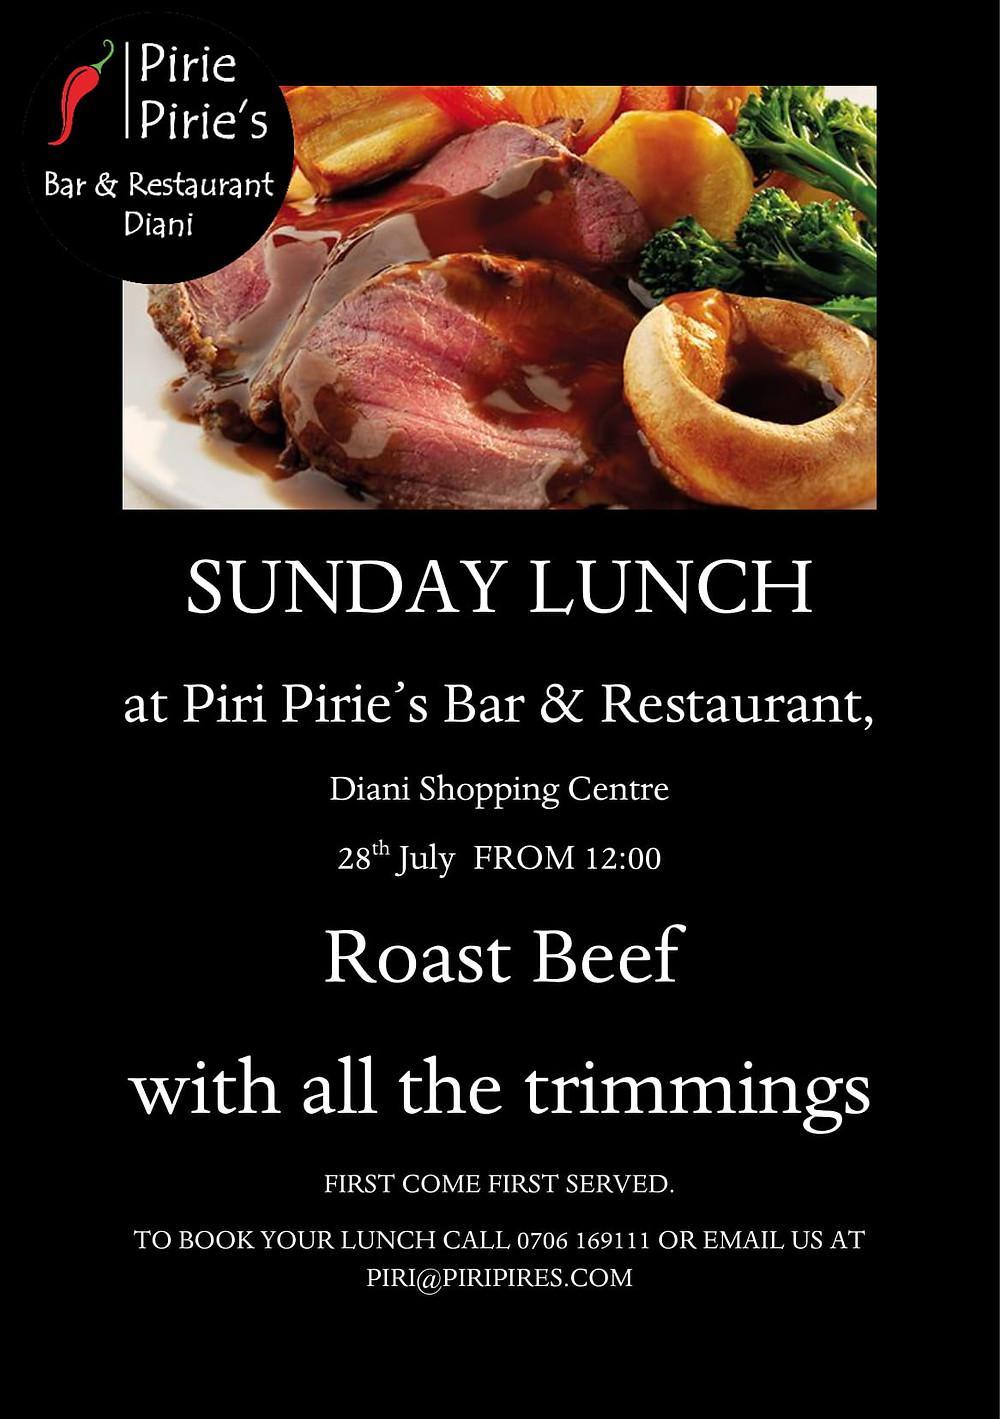 Roast Beef at Piri Piries